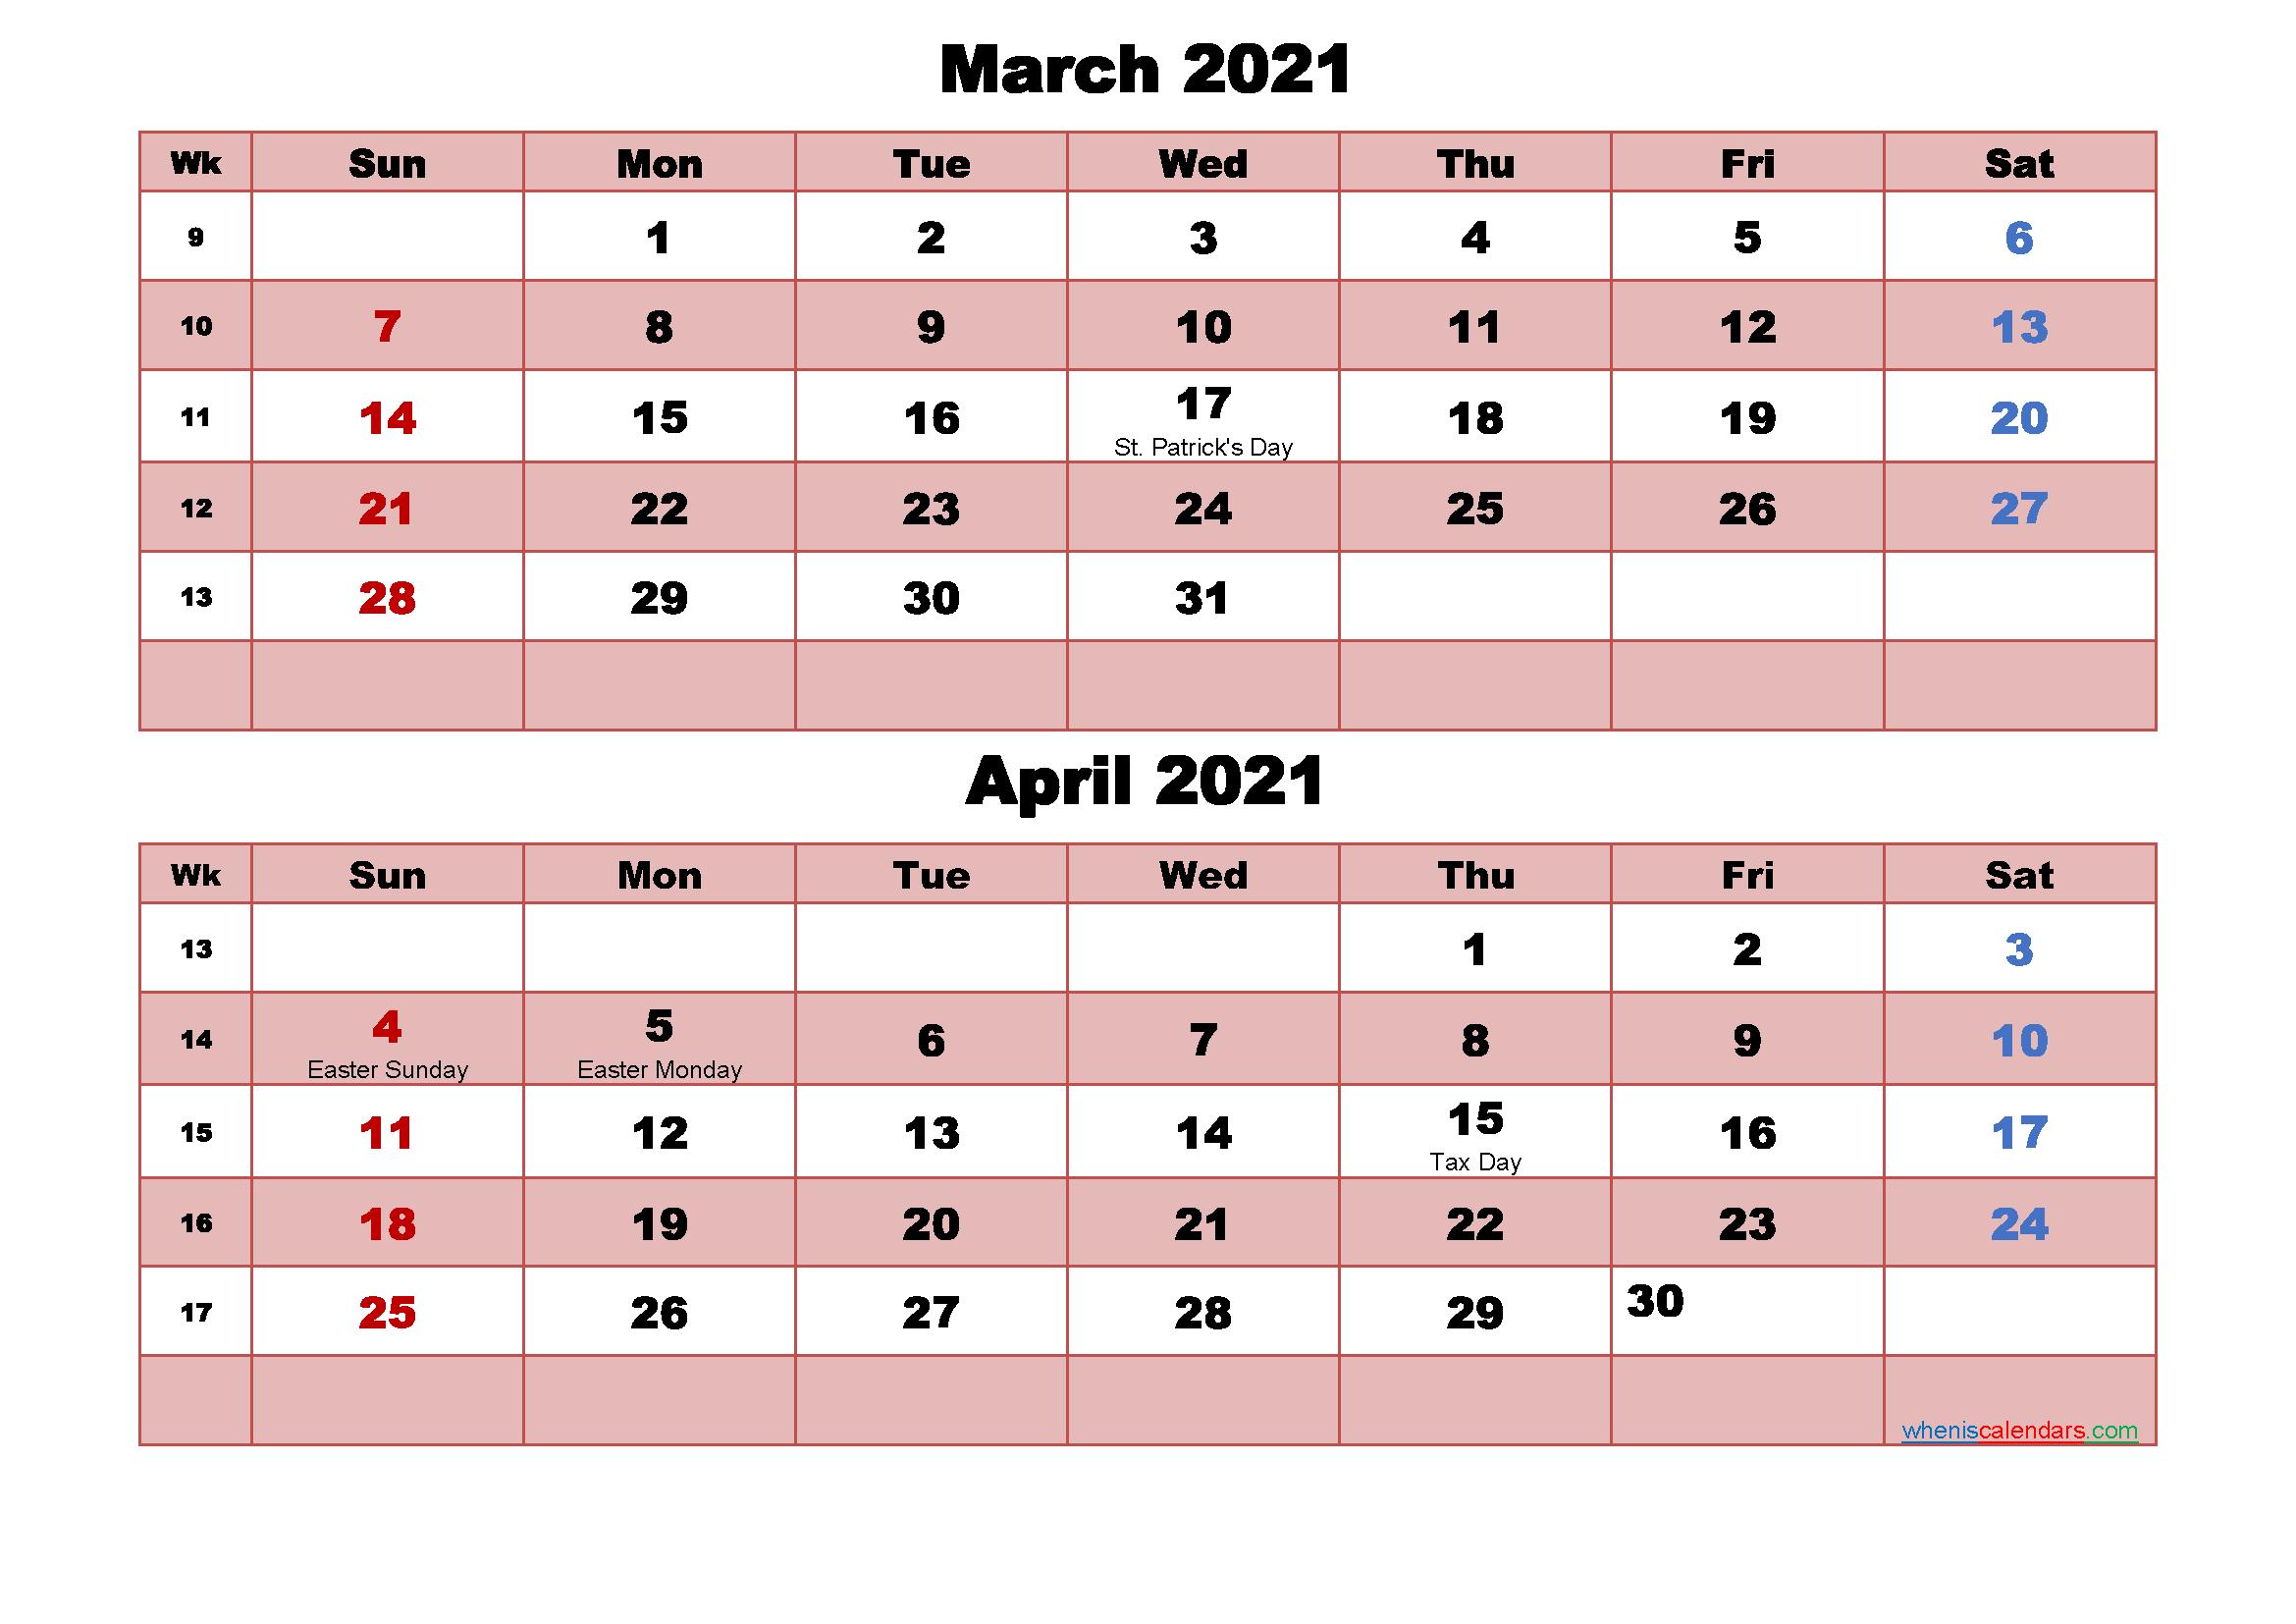 March And April Calendar 2021 Printable Word, Pdf Inside March And April 2021 Calendar